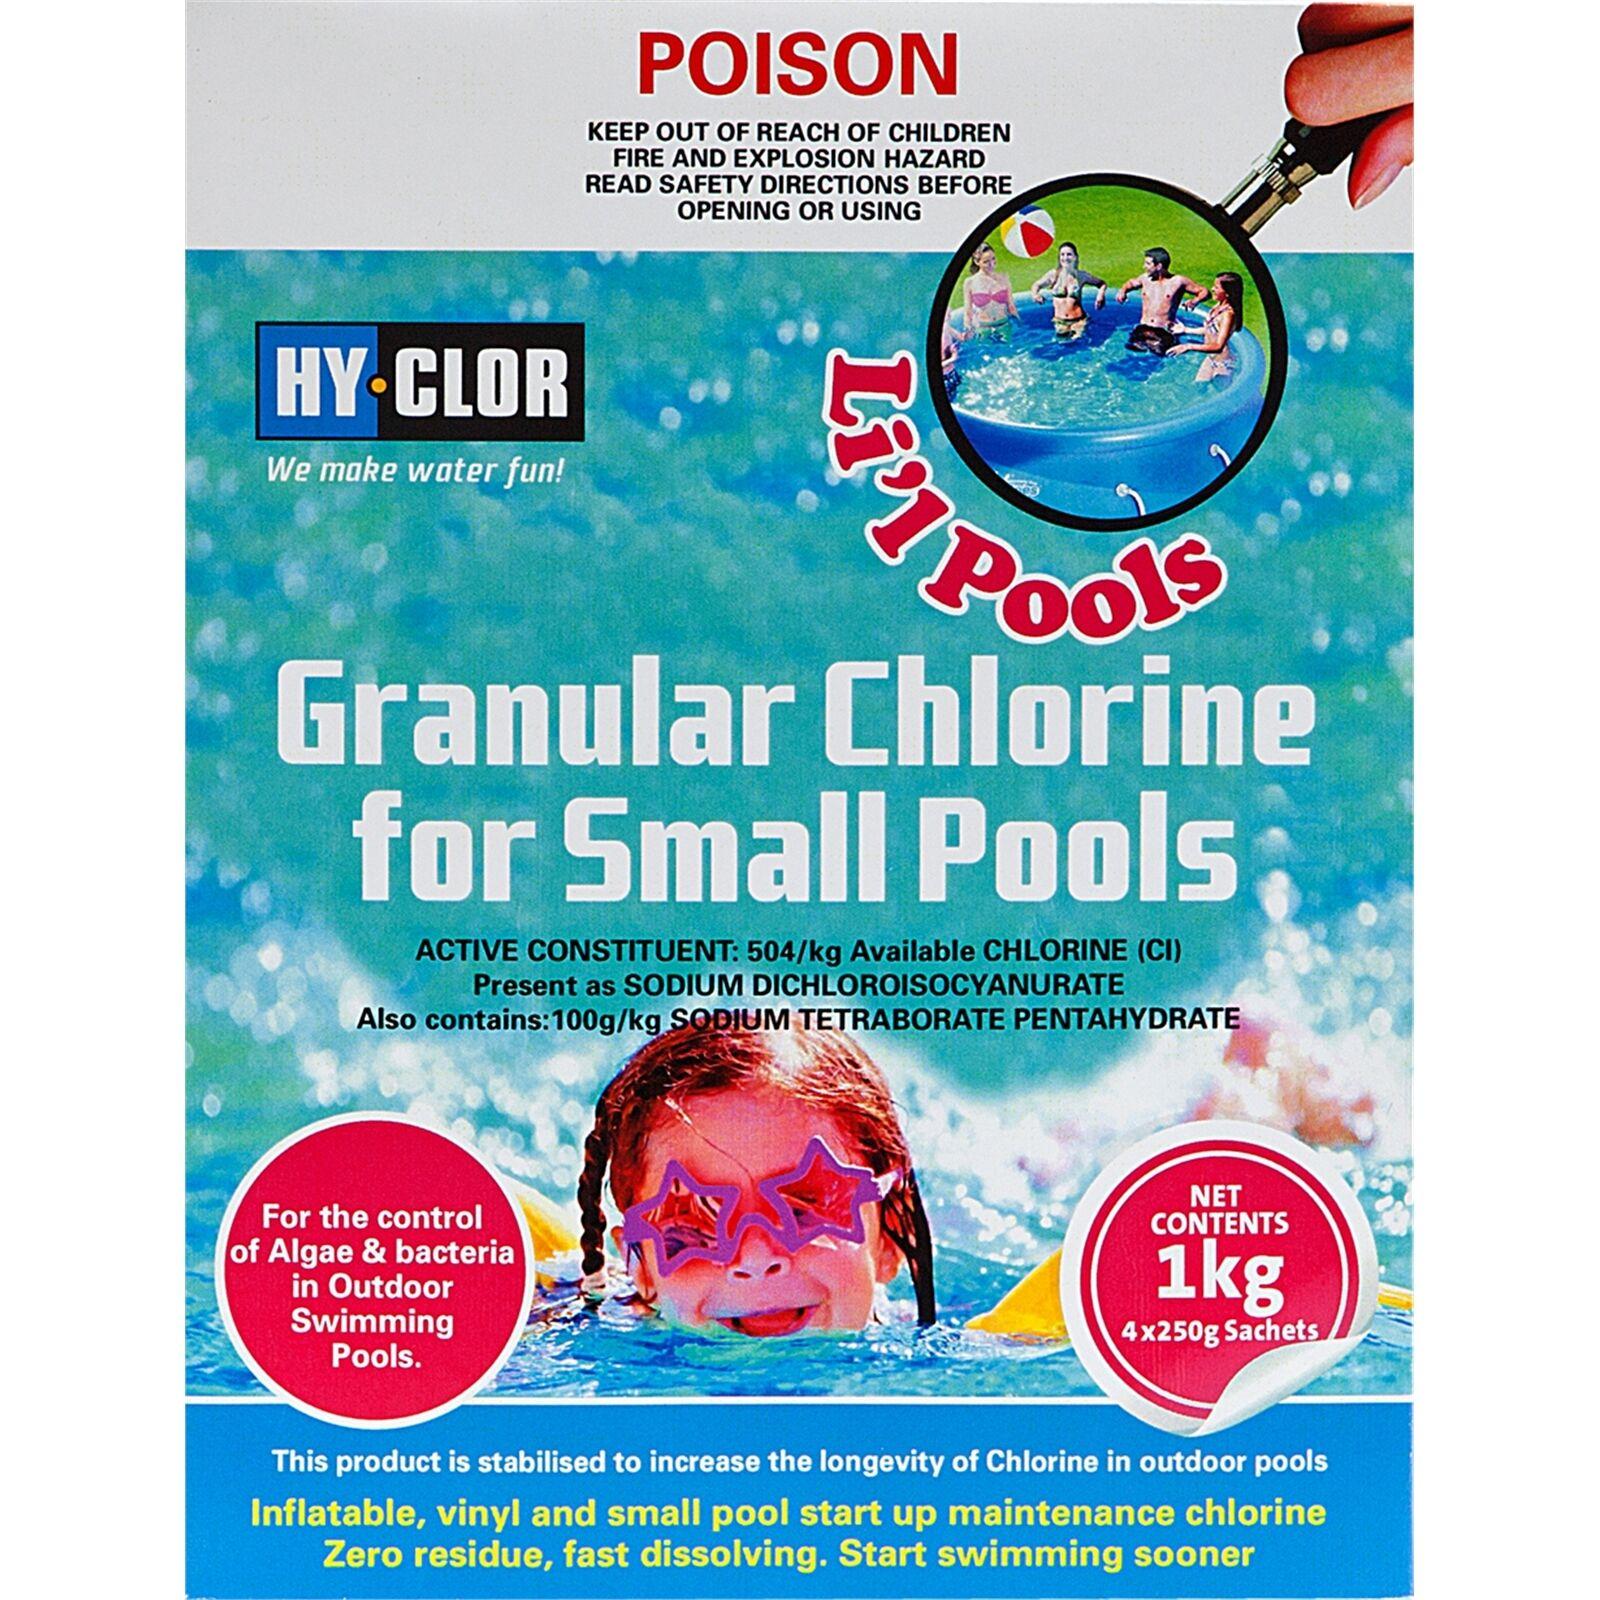 Hy-Clor 1kg GRANULAR CHLORINE Ideal for Small Pools Control of Algae & Bacteria